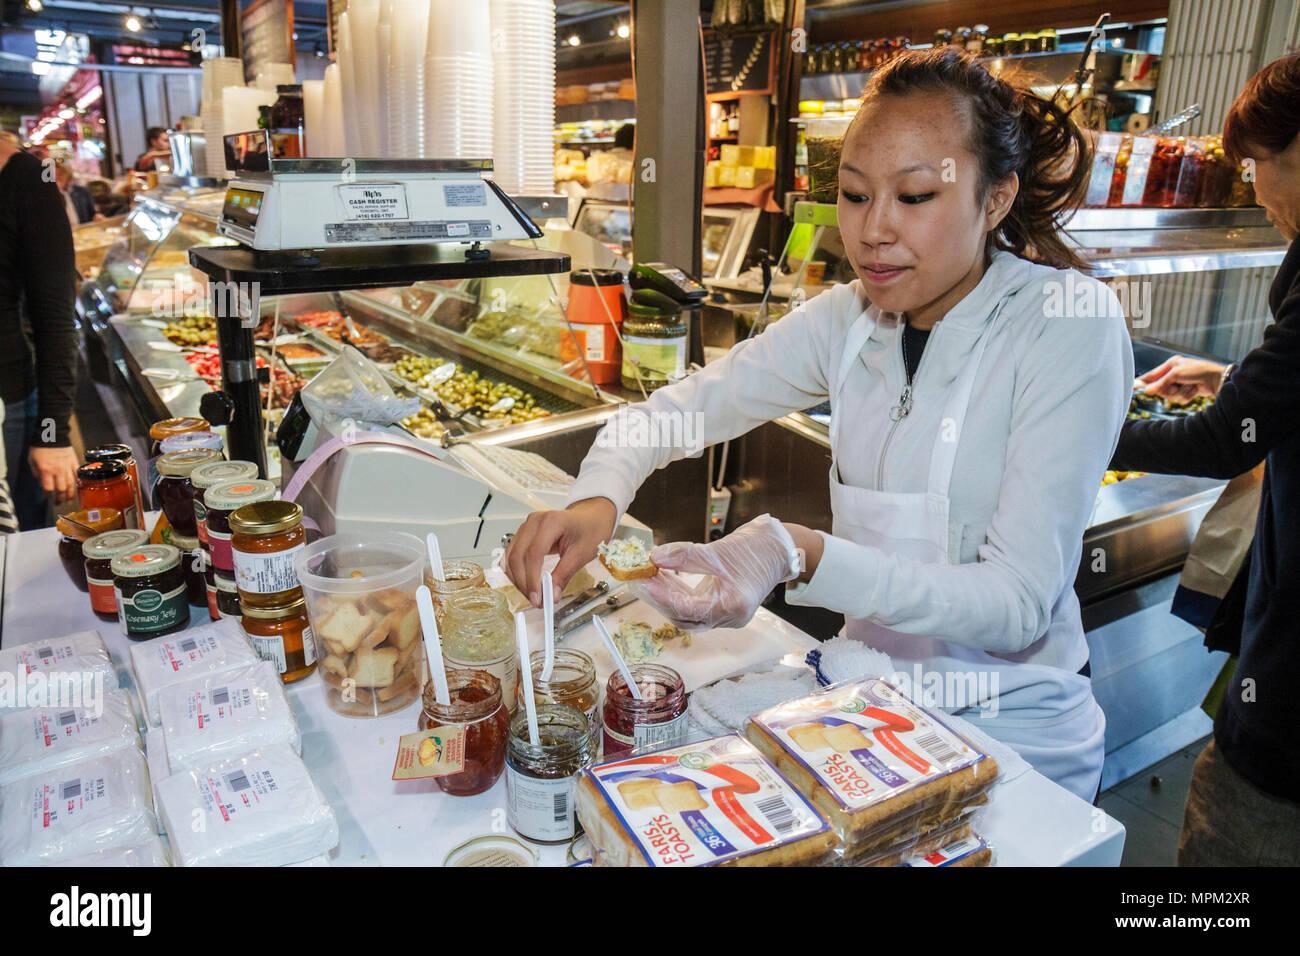 Toronto Canada Ontario St. Lawrence Market shopping vendor merchant Asian woman sales clerk employee free sample toast jelly jam - Stock Image